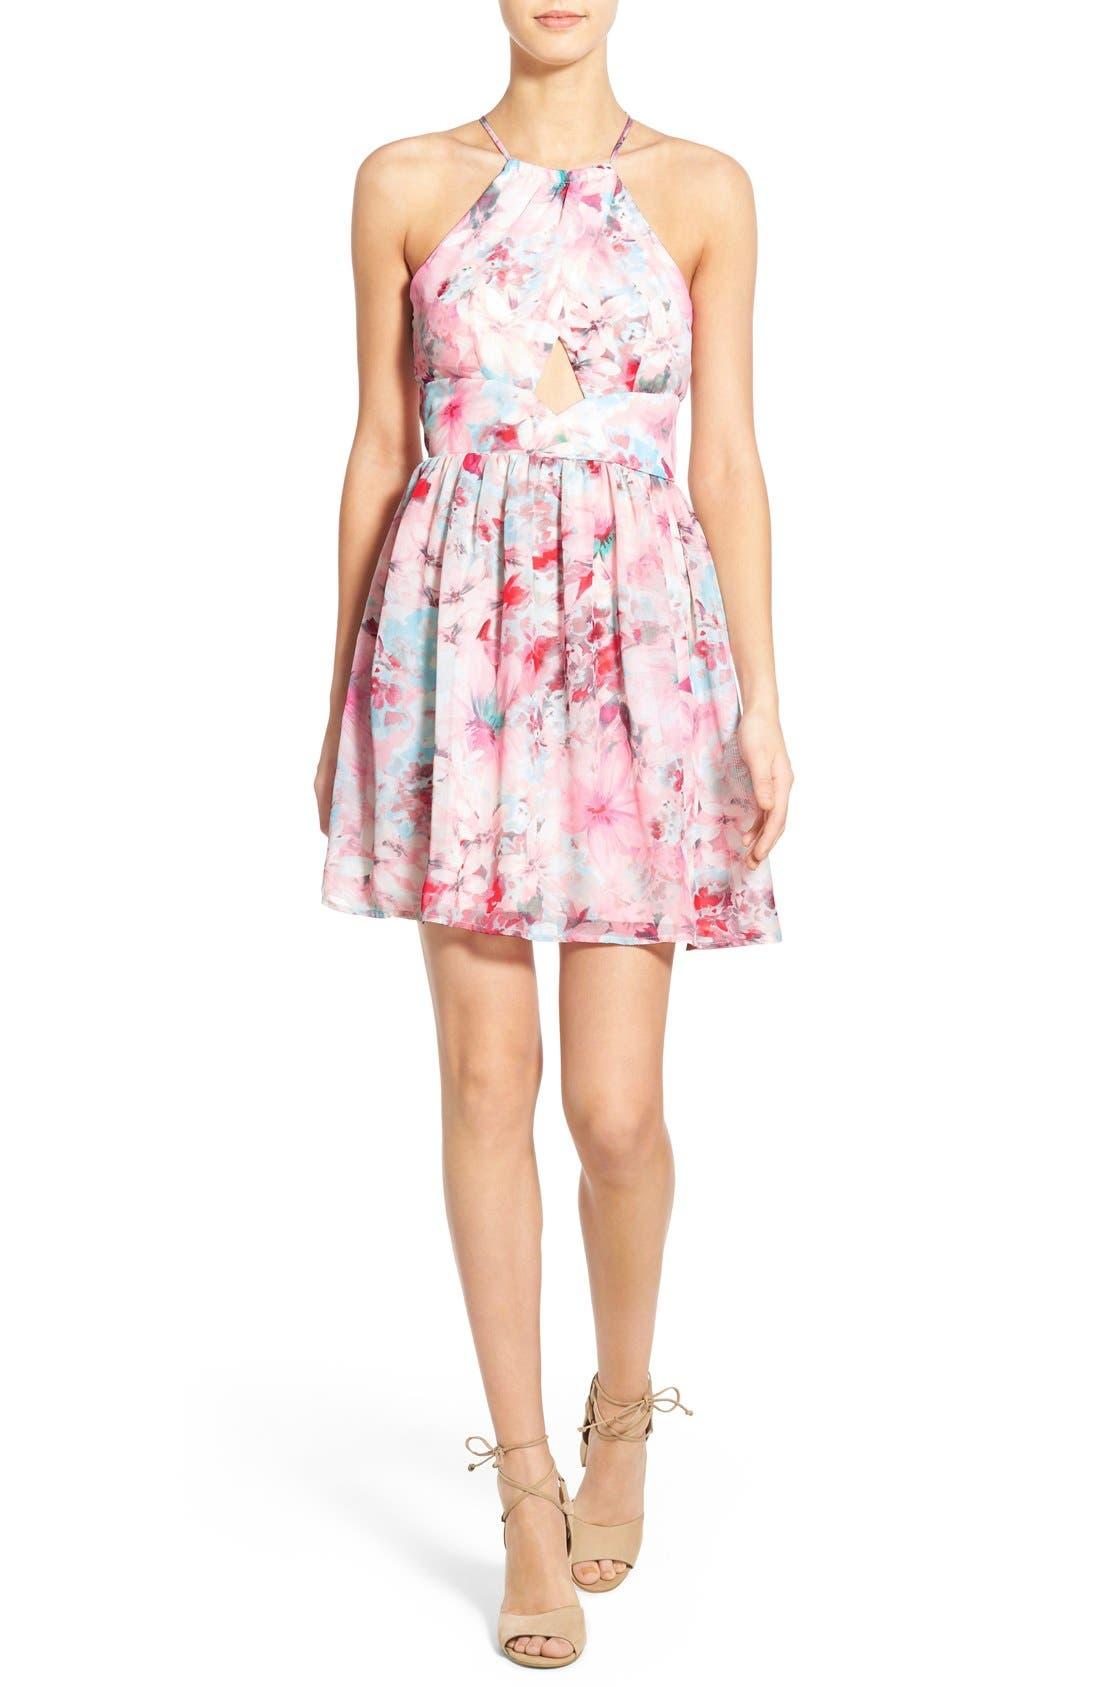 Alternate Image 1 Selected - Trixxi Floral Print High Neck Skater Dress